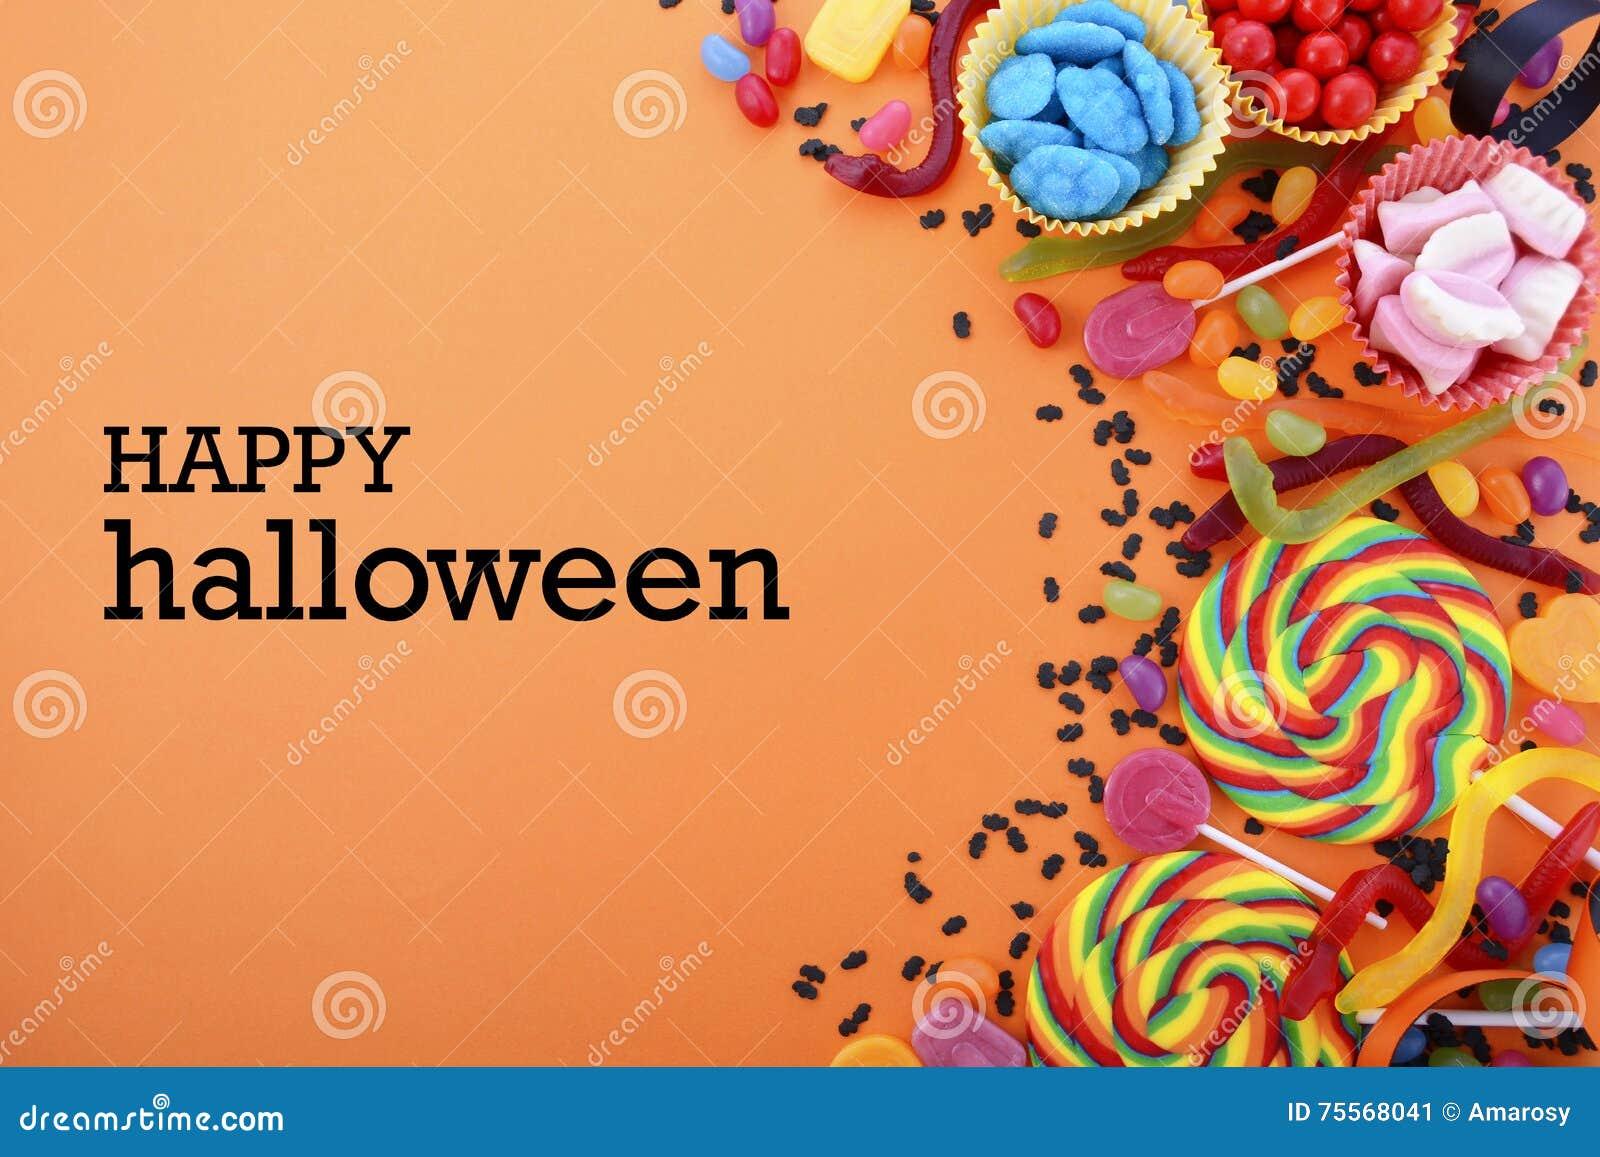 happy halloween candy background stock image image 75568041